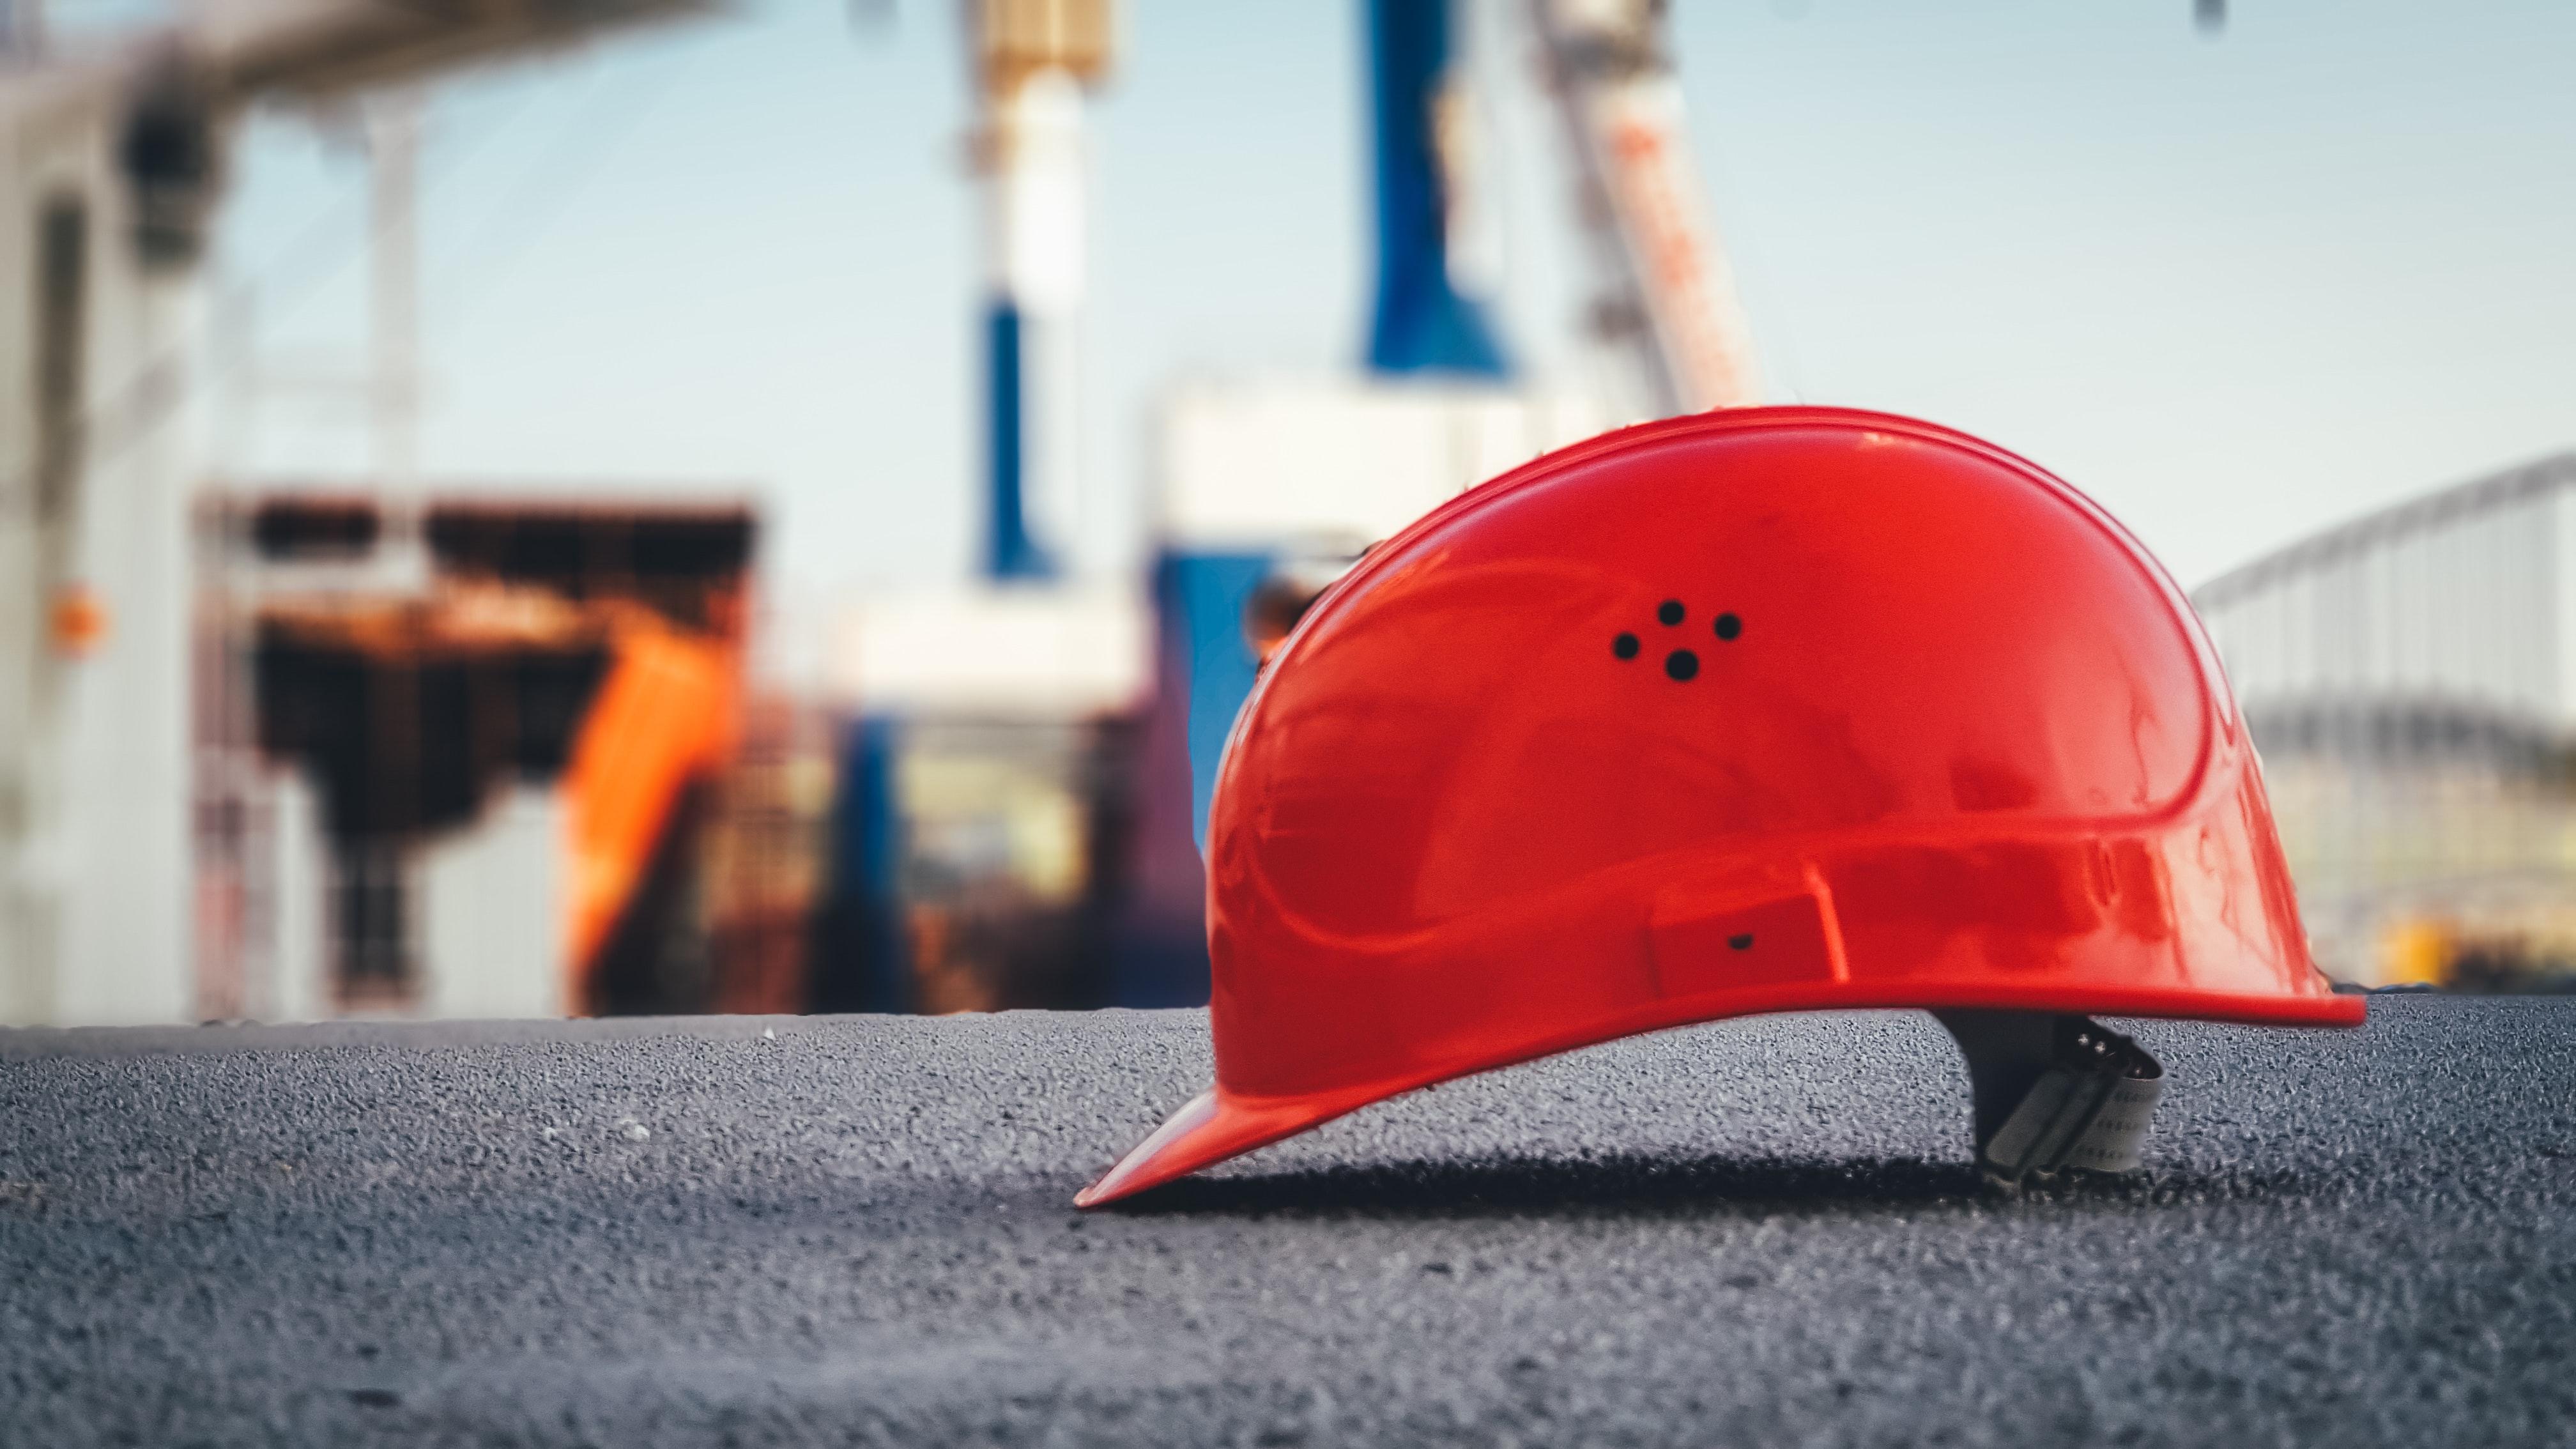 Hardhat on concrete at construction site